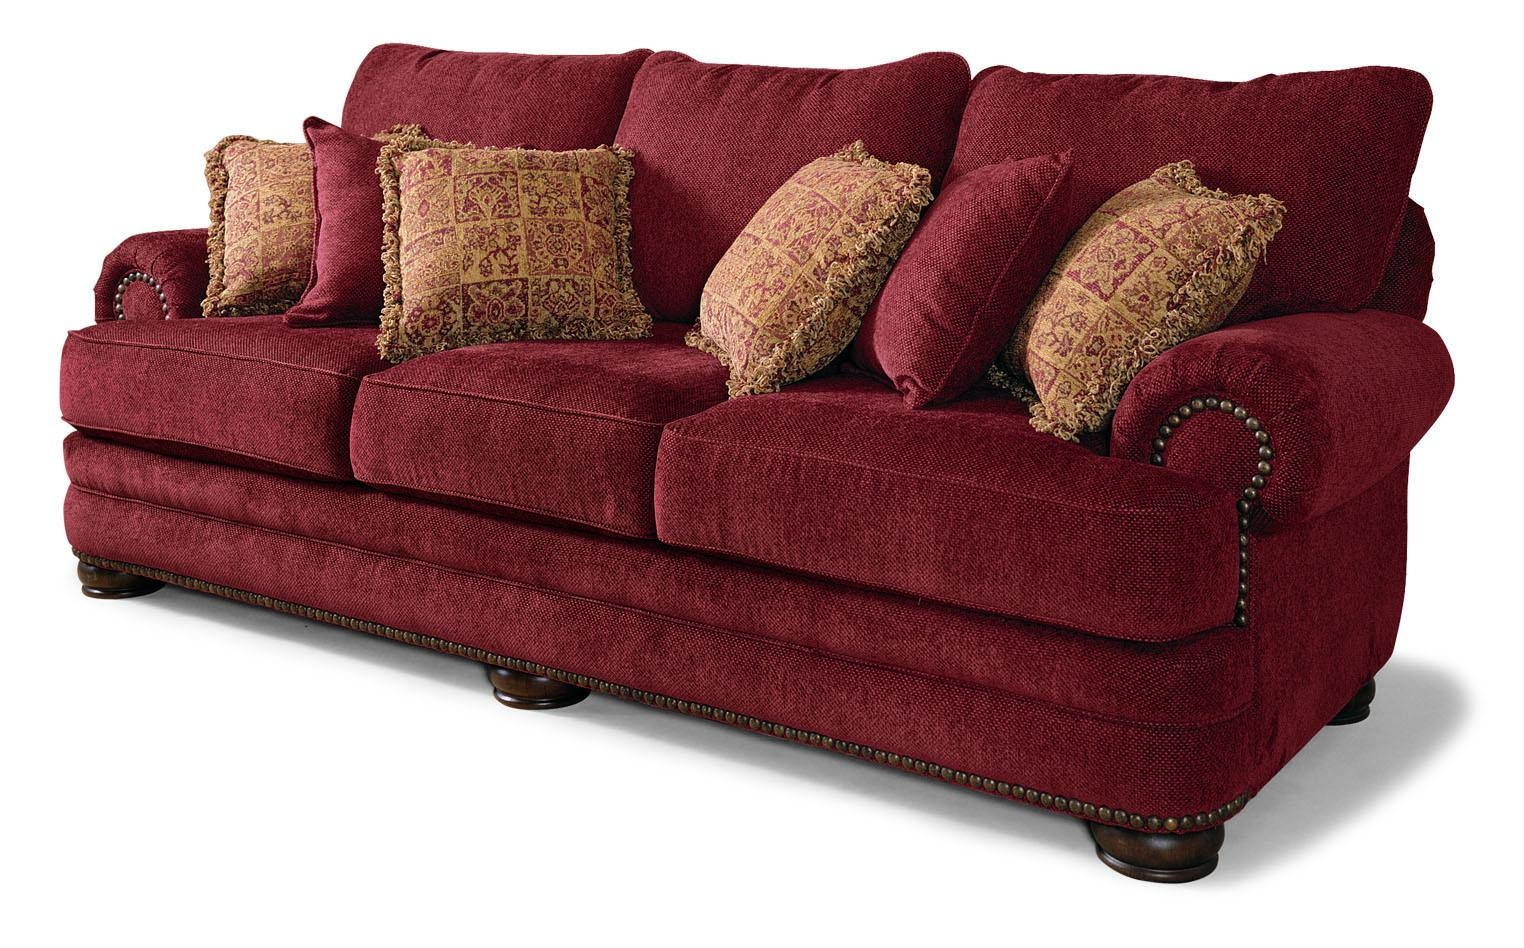 Lane Stanton Stationary Sofa Pertaining To Lane Furniture Sofas (View 19 of 20)